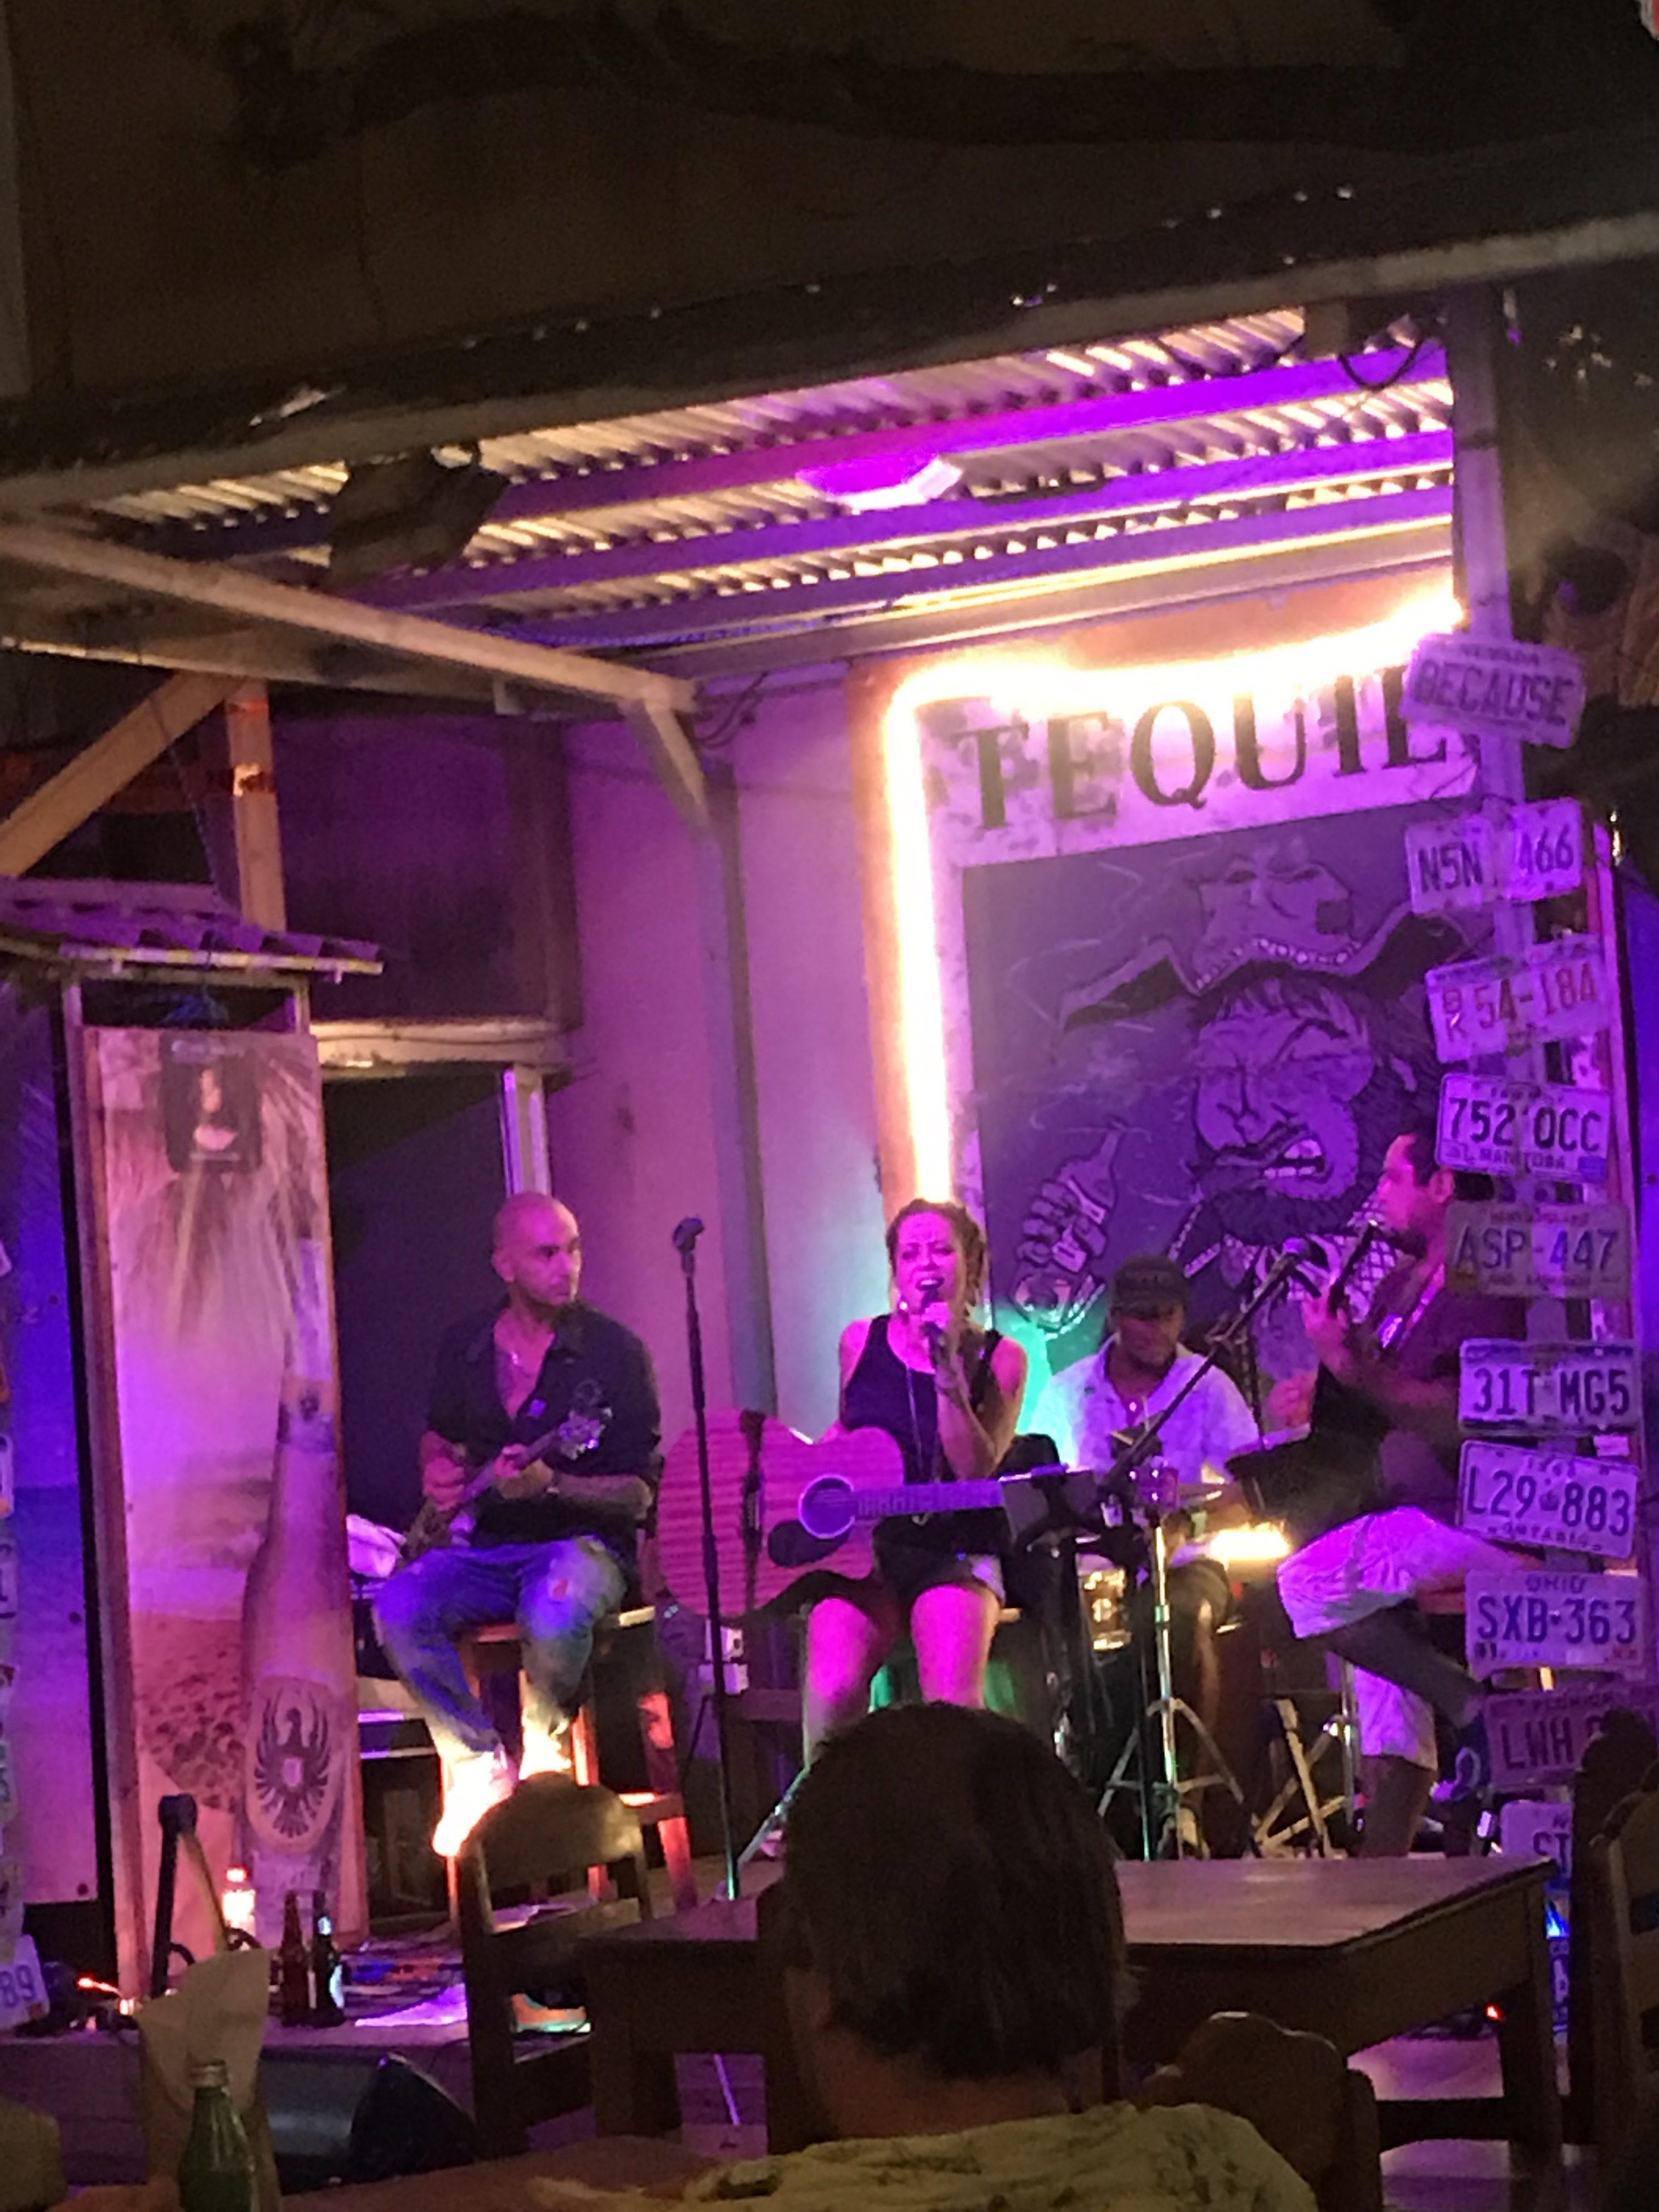 More live music